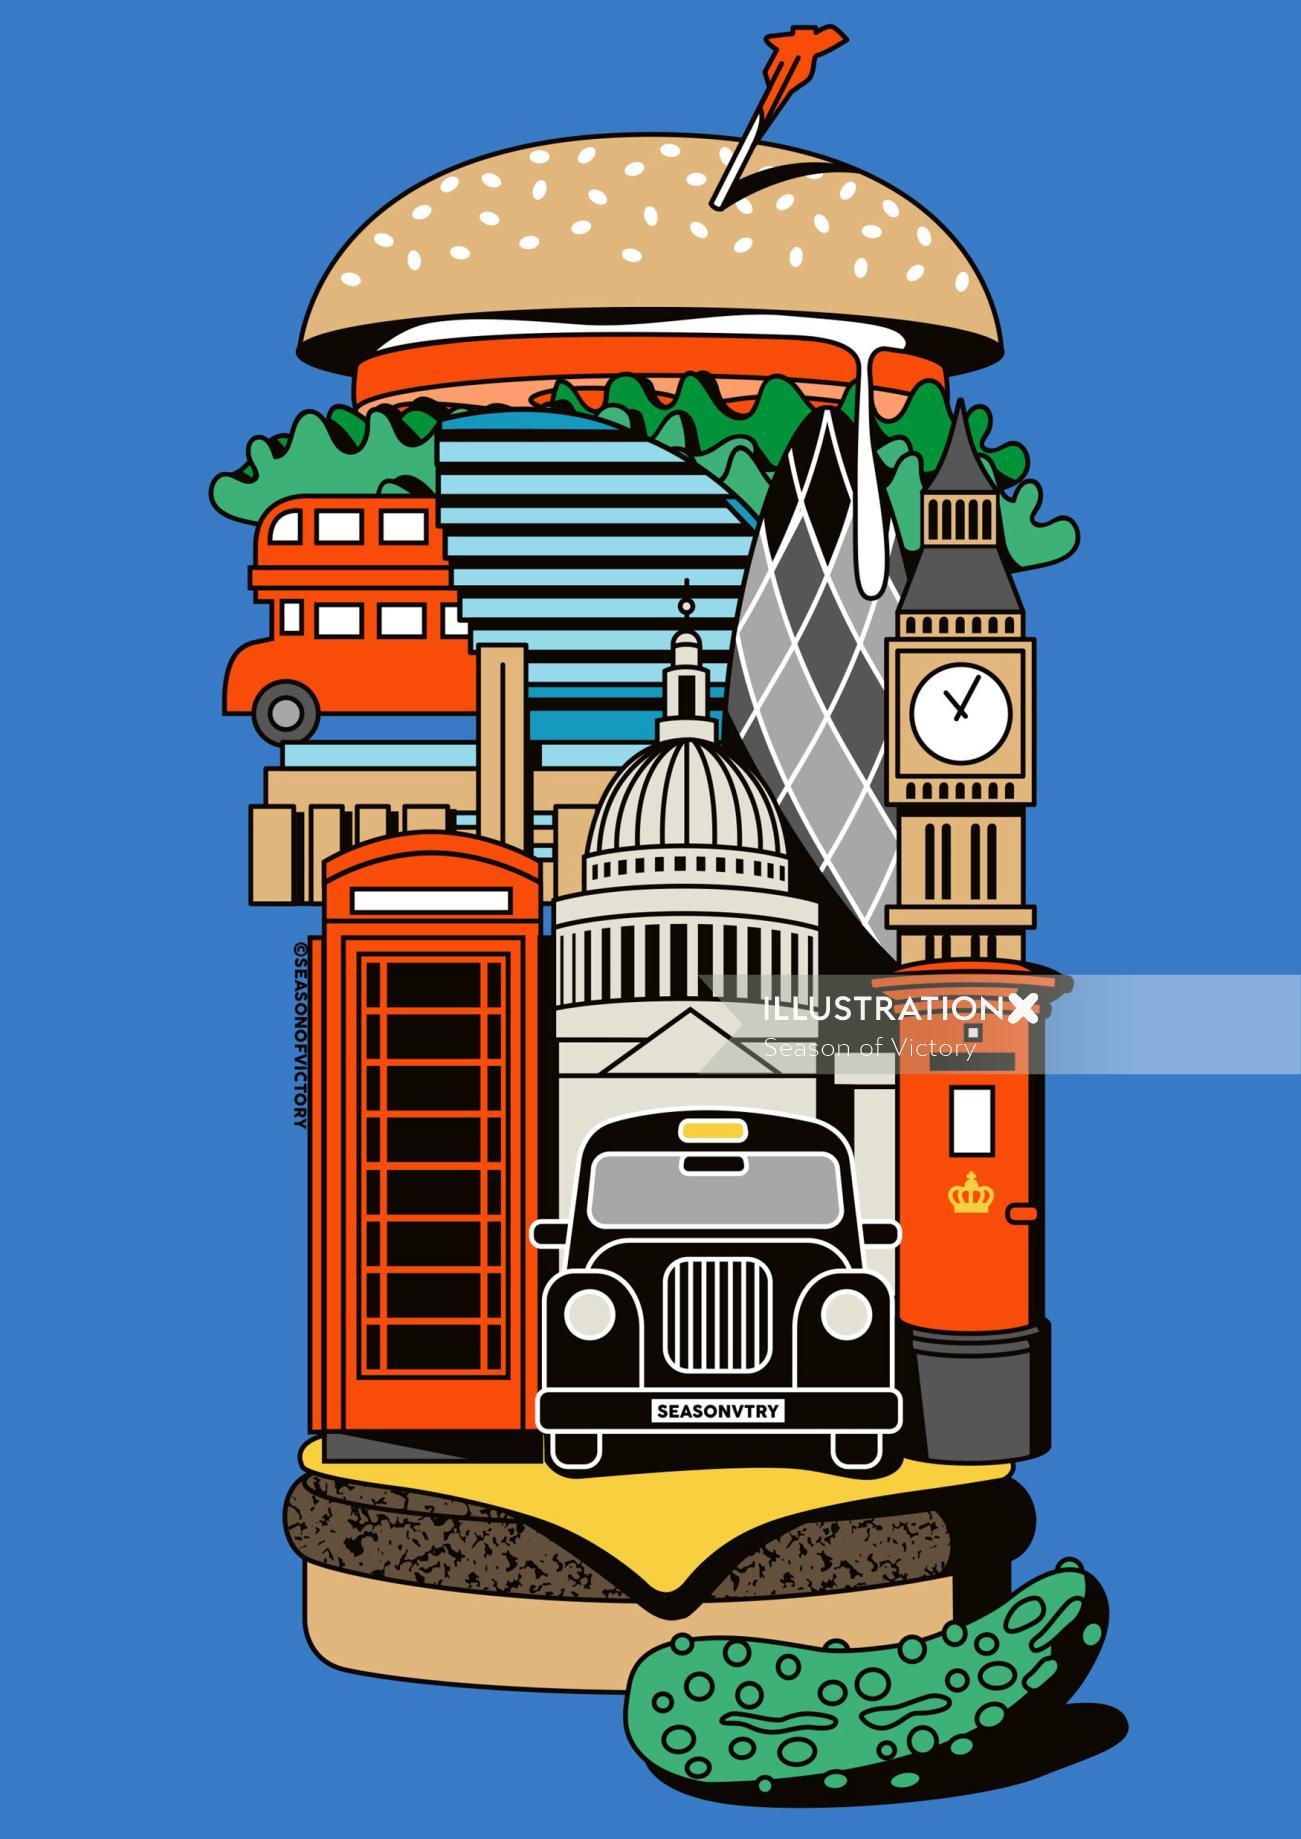 food, london, guide, cover art, hamburger, burger, cab, black cab, city, restaurant, bigben, london